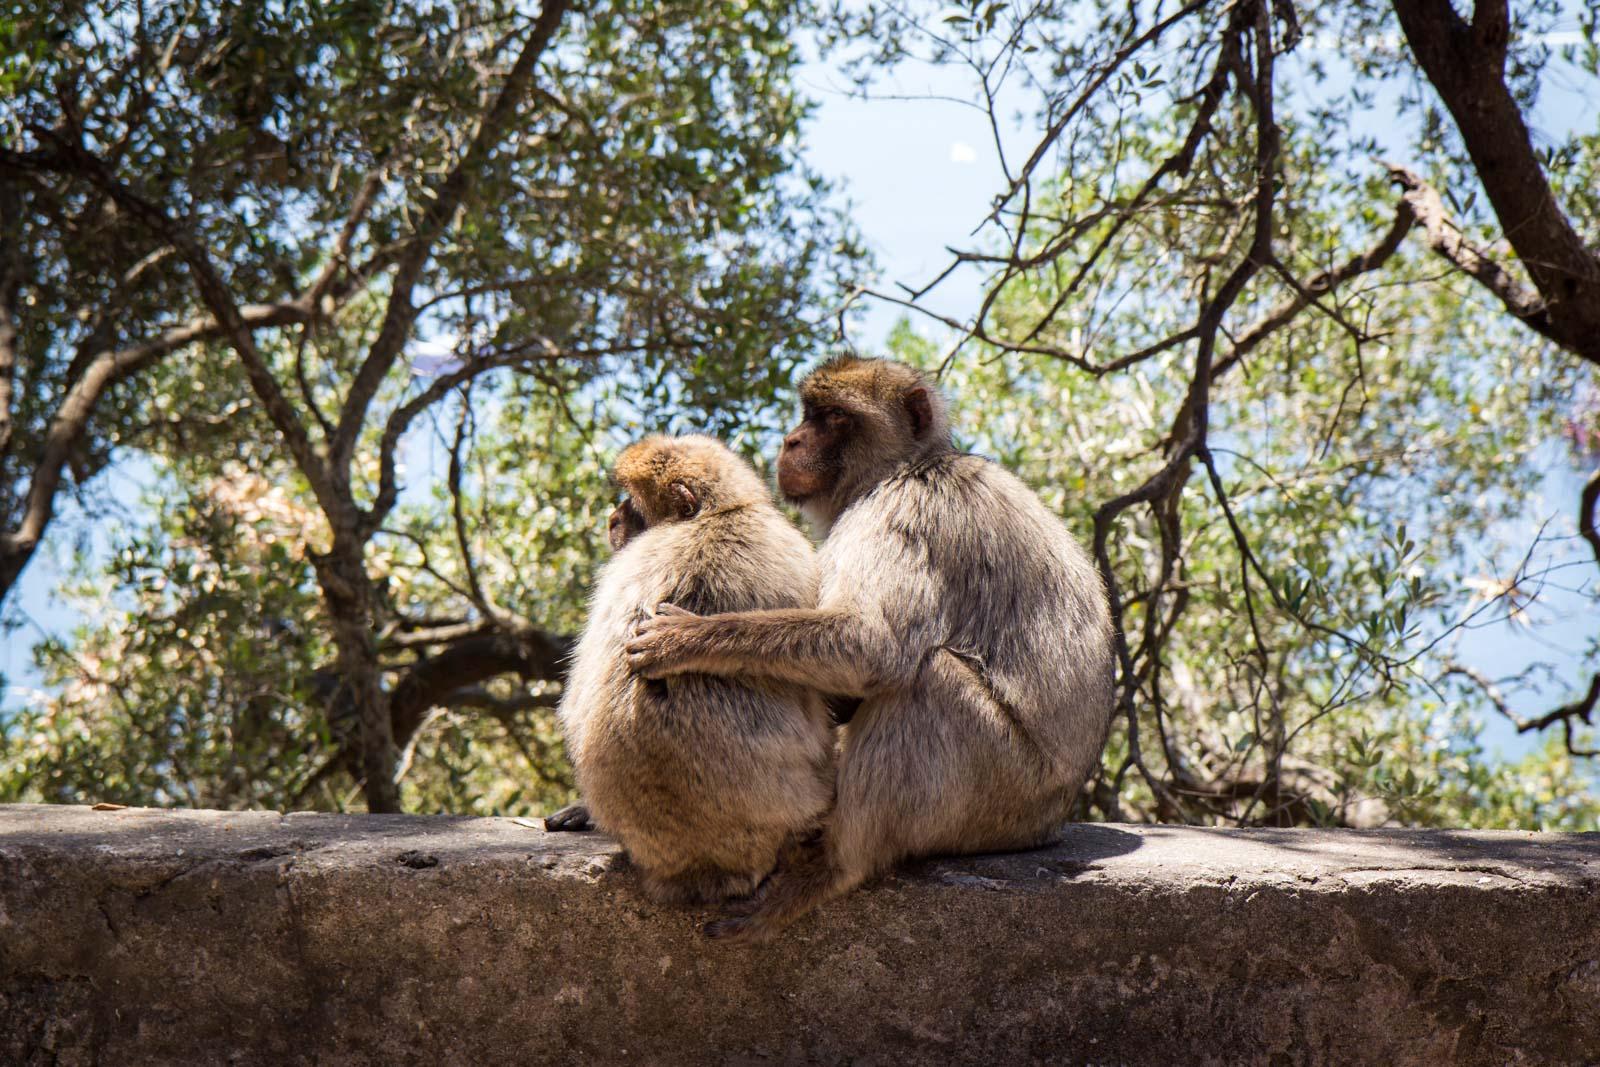 Apes' Den, Rock of Gibraltar